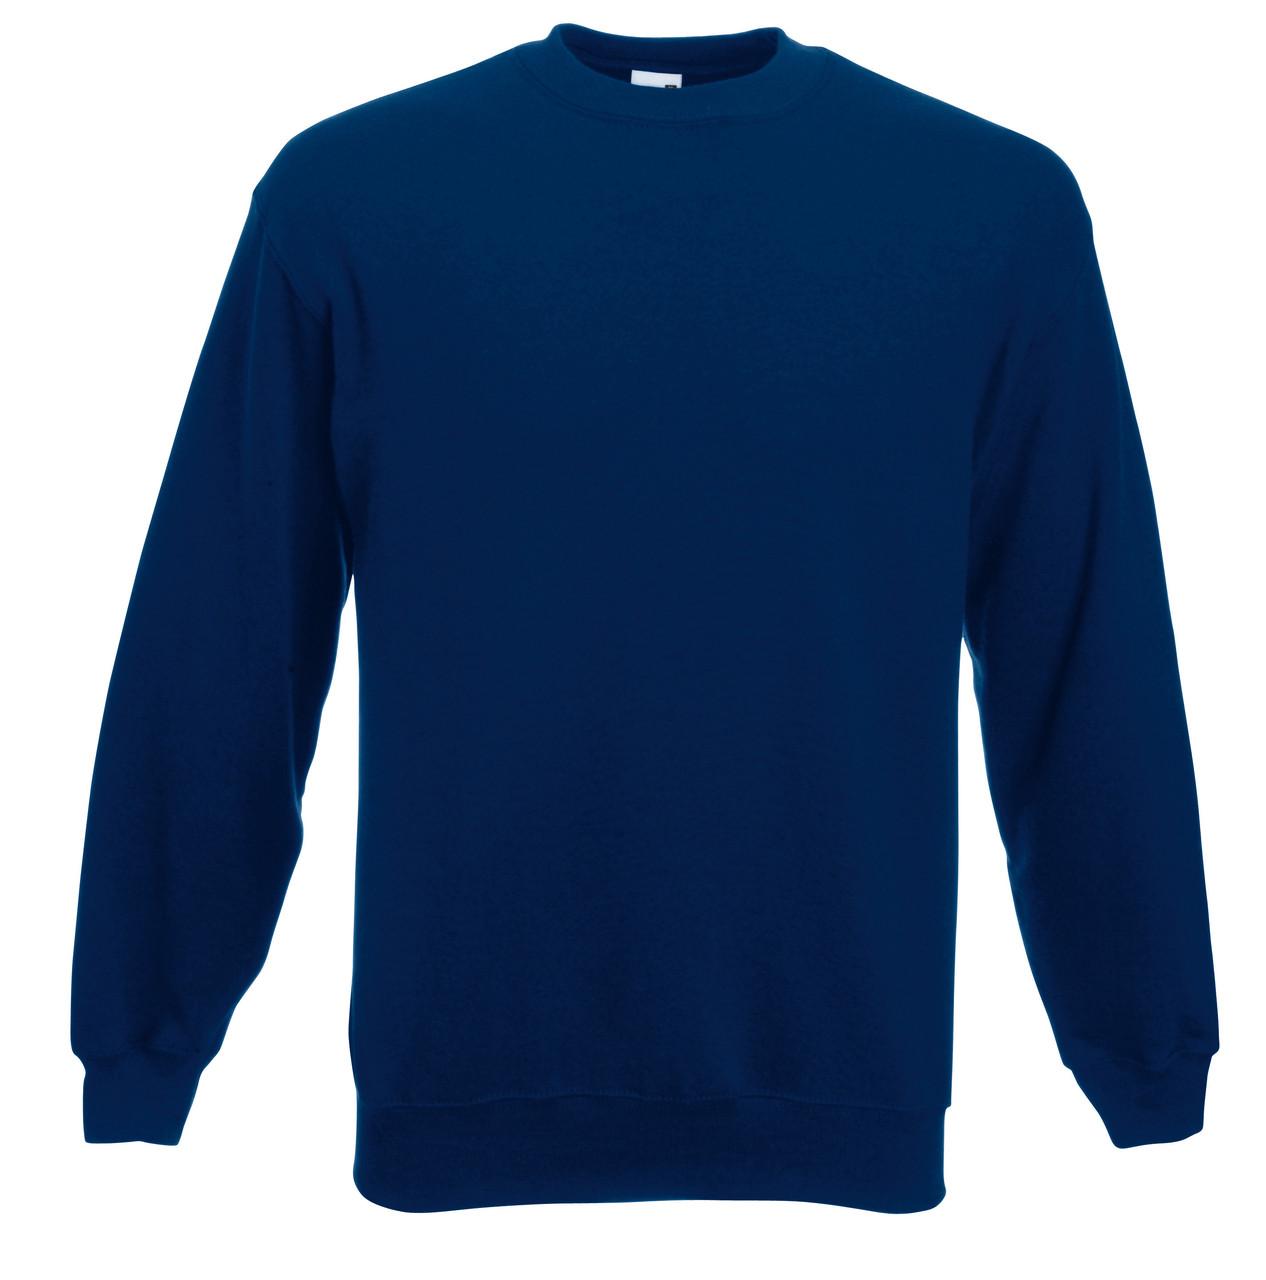 Мужской классический свитер Тёмно-синий Fruit Of The Loom 62-202-32 Xxl